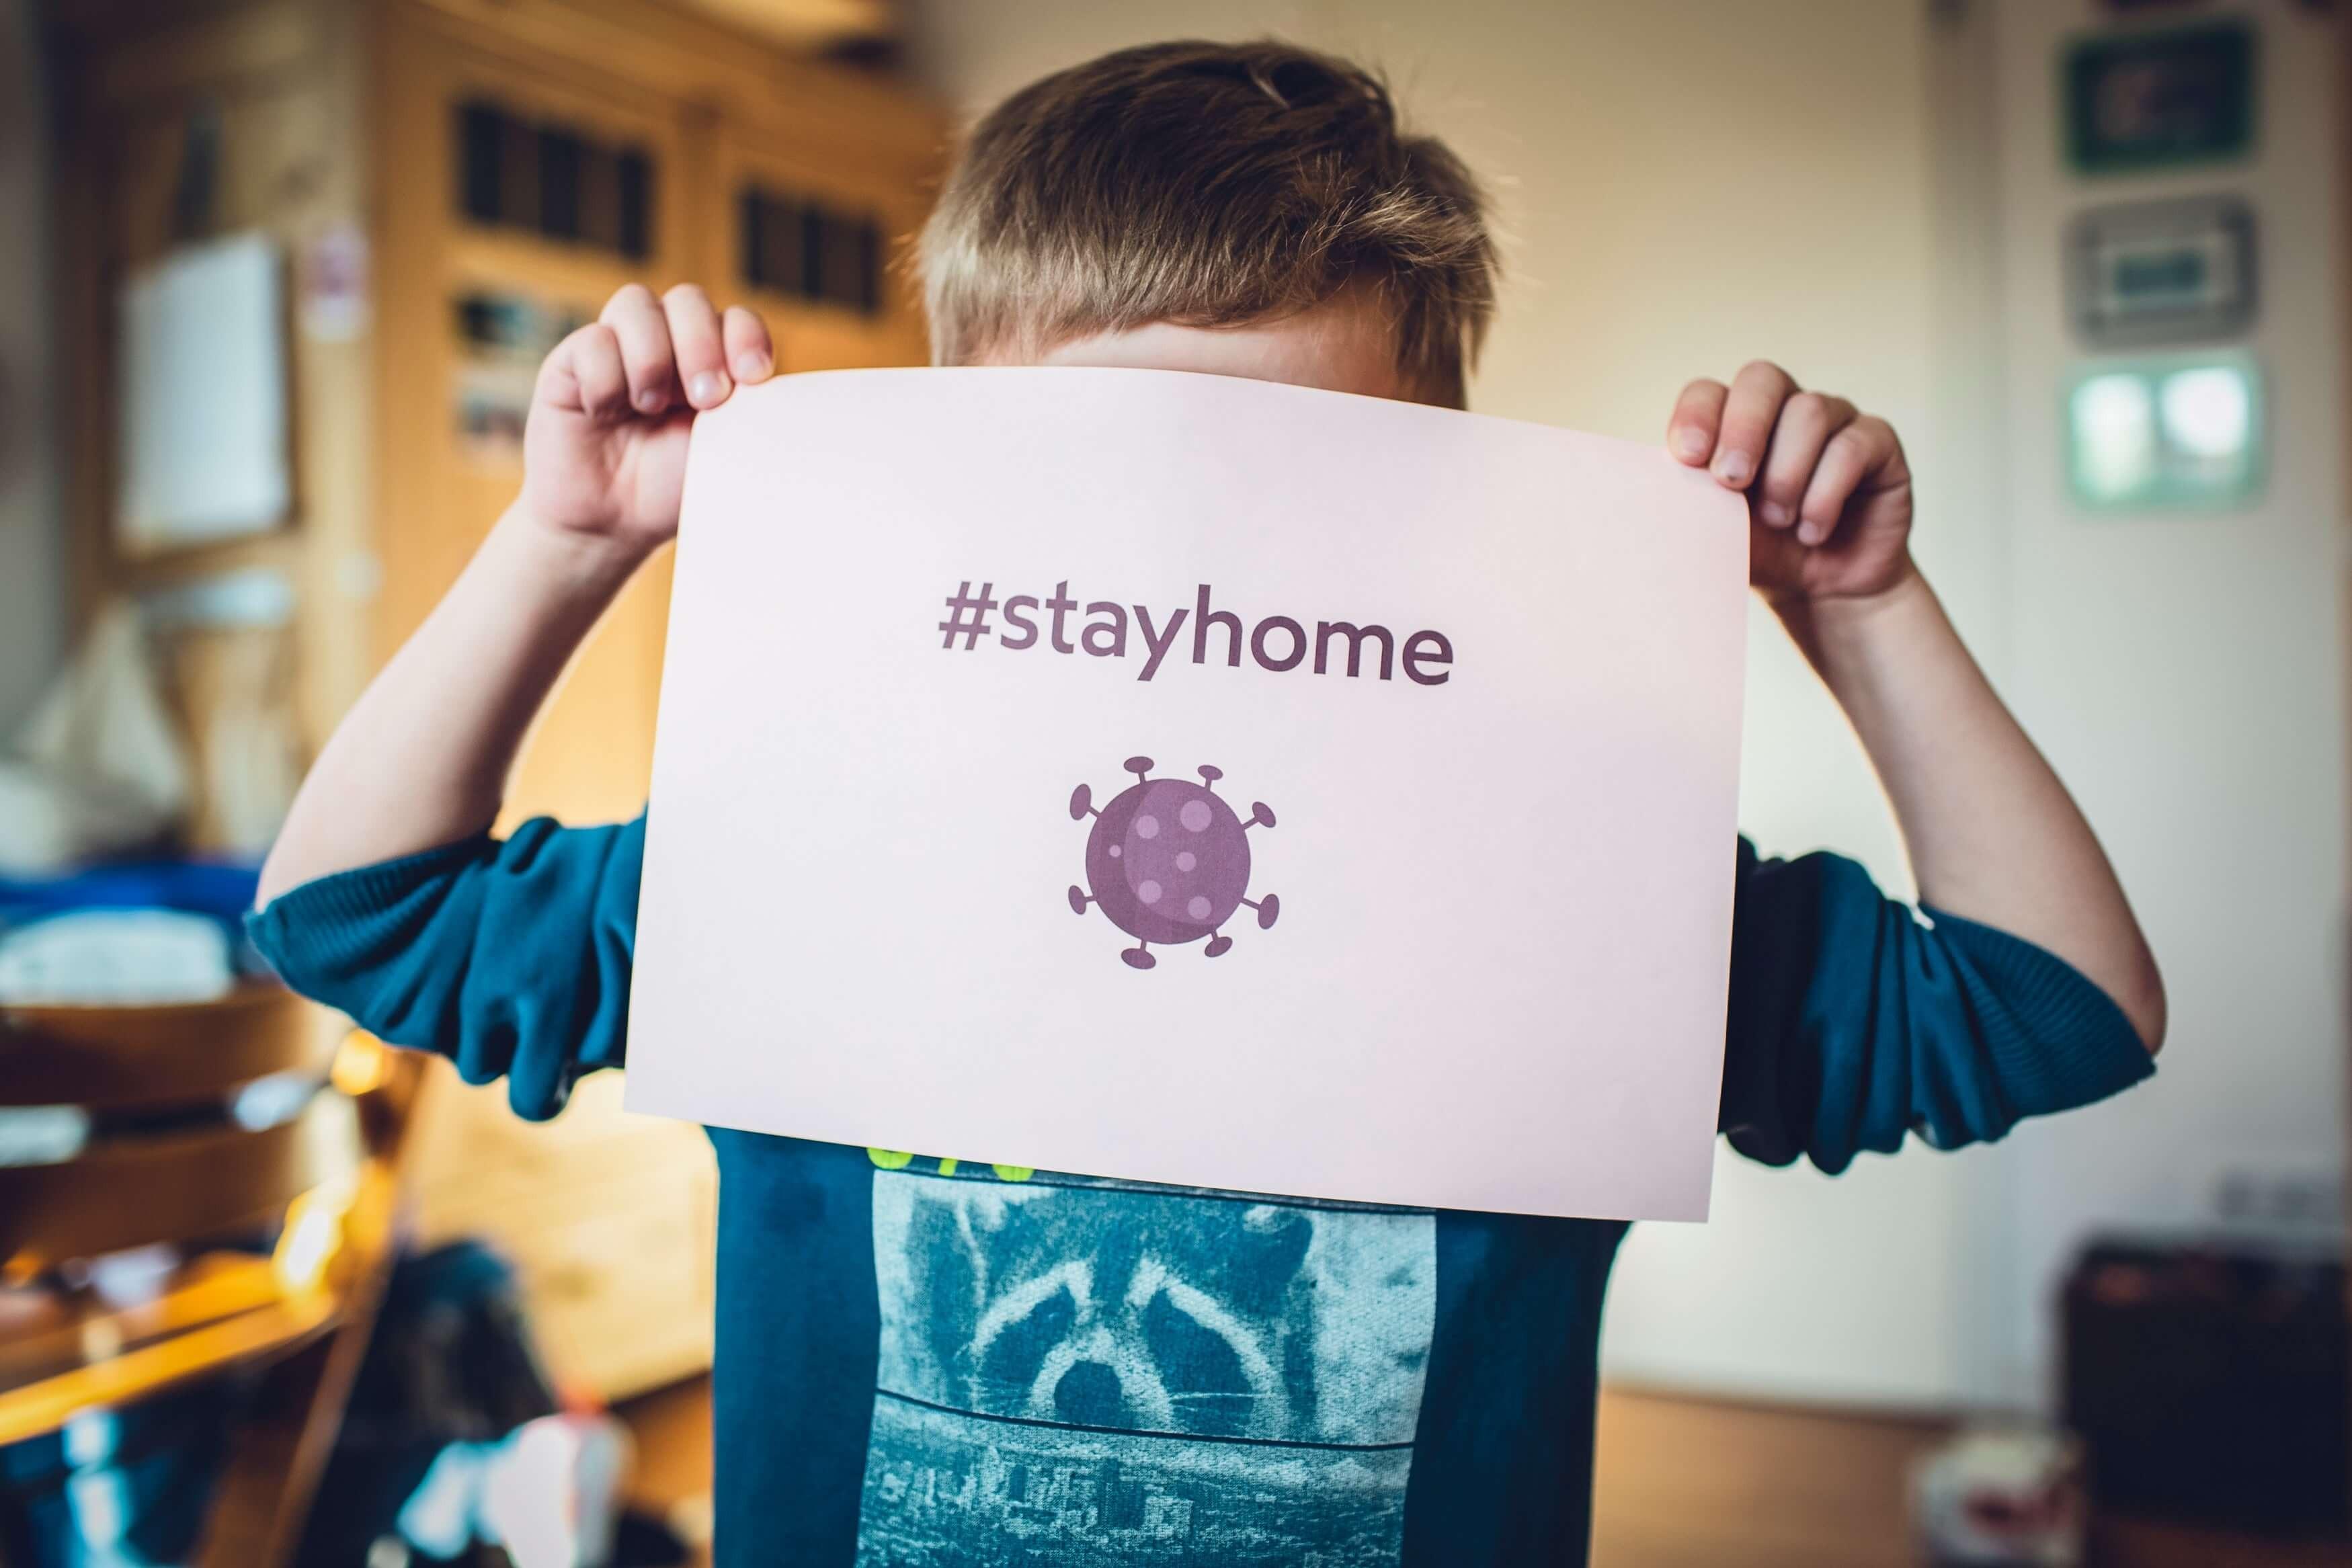 Niño aconsejando estar en casa debido al coronavirus